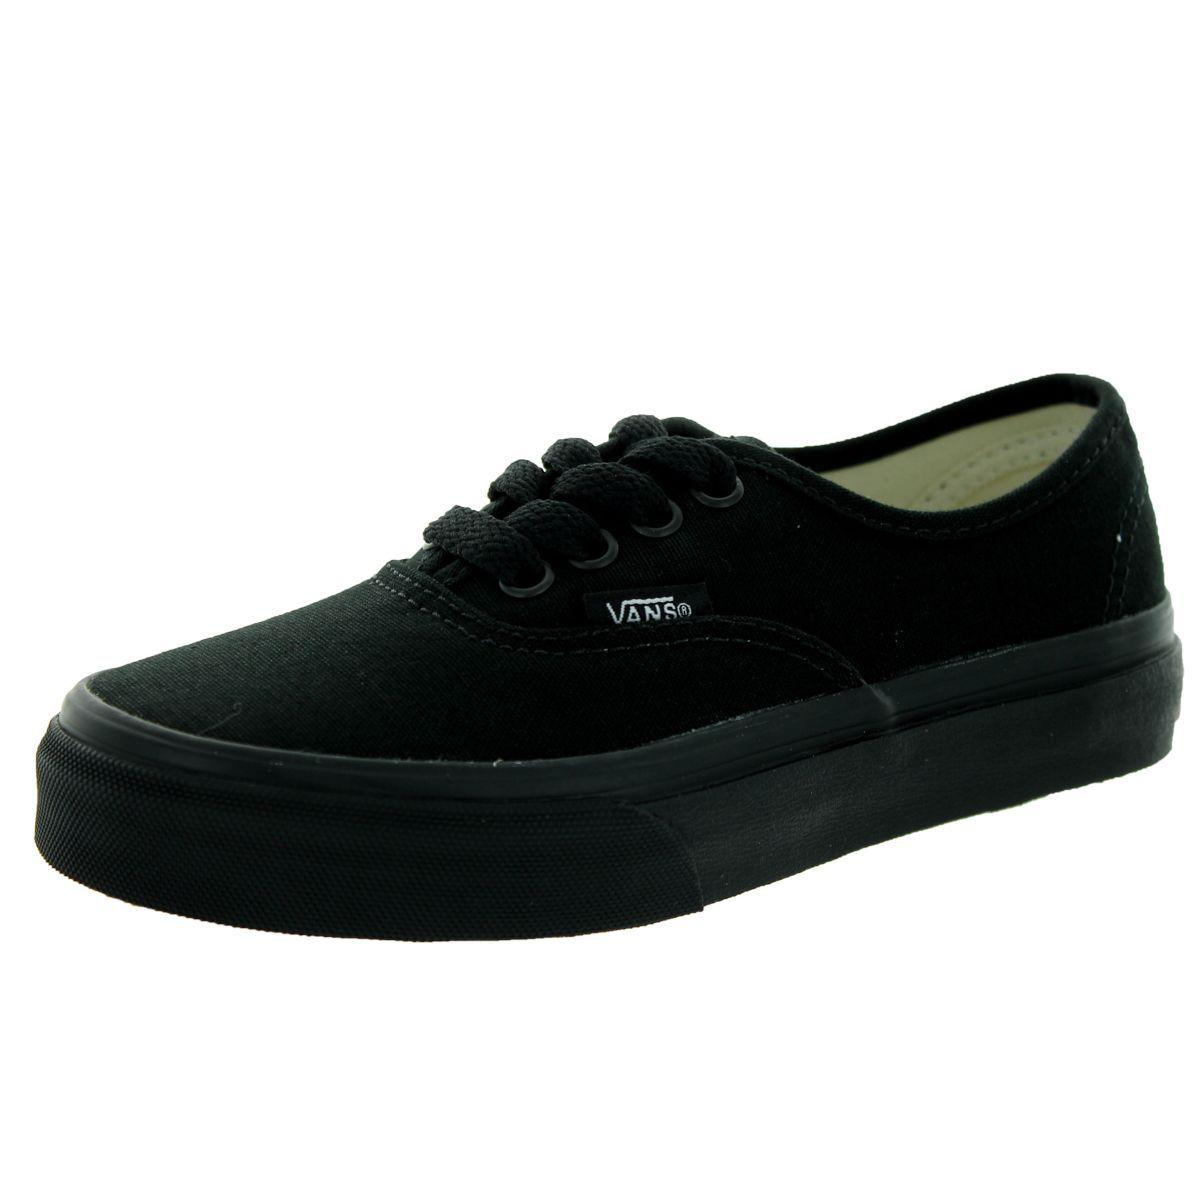 Vans Kid's Authentic / Skate Shoe